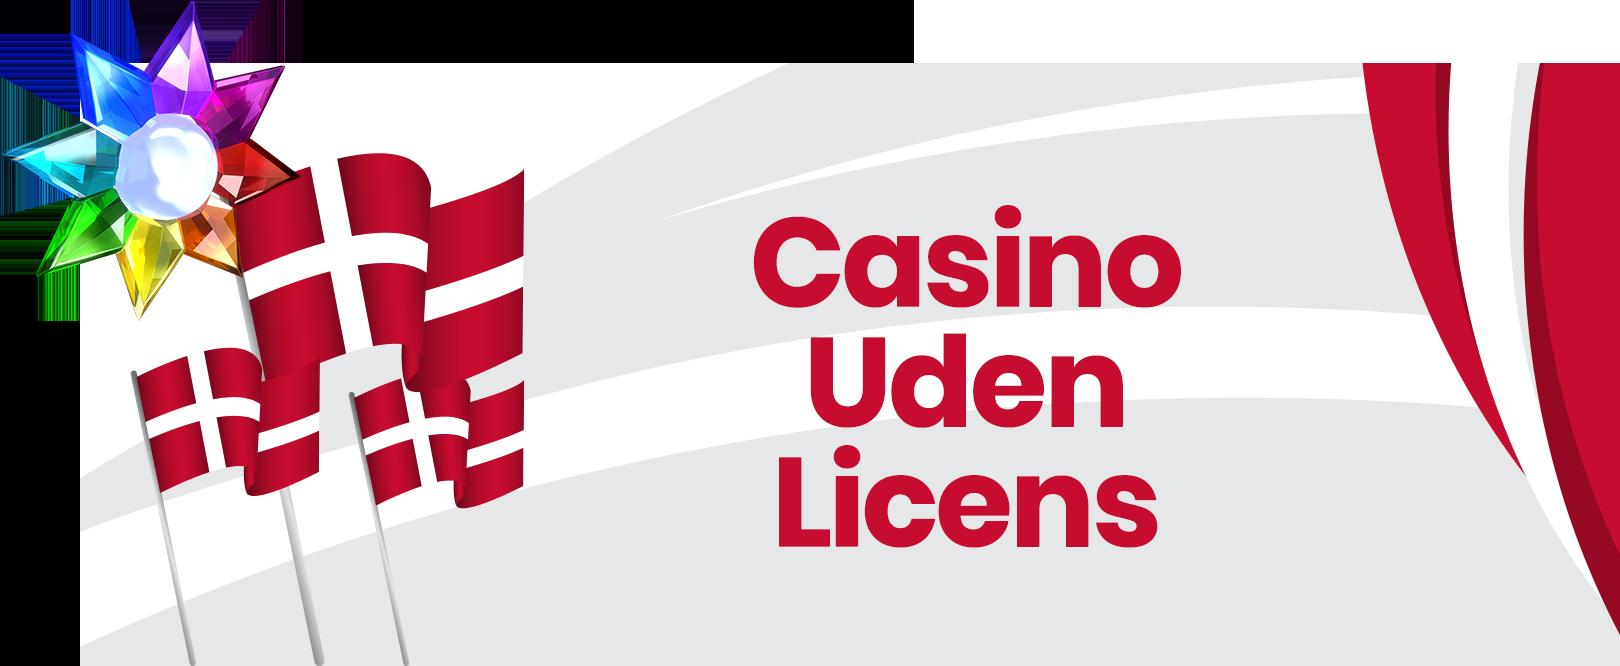 casino uden dansk licens